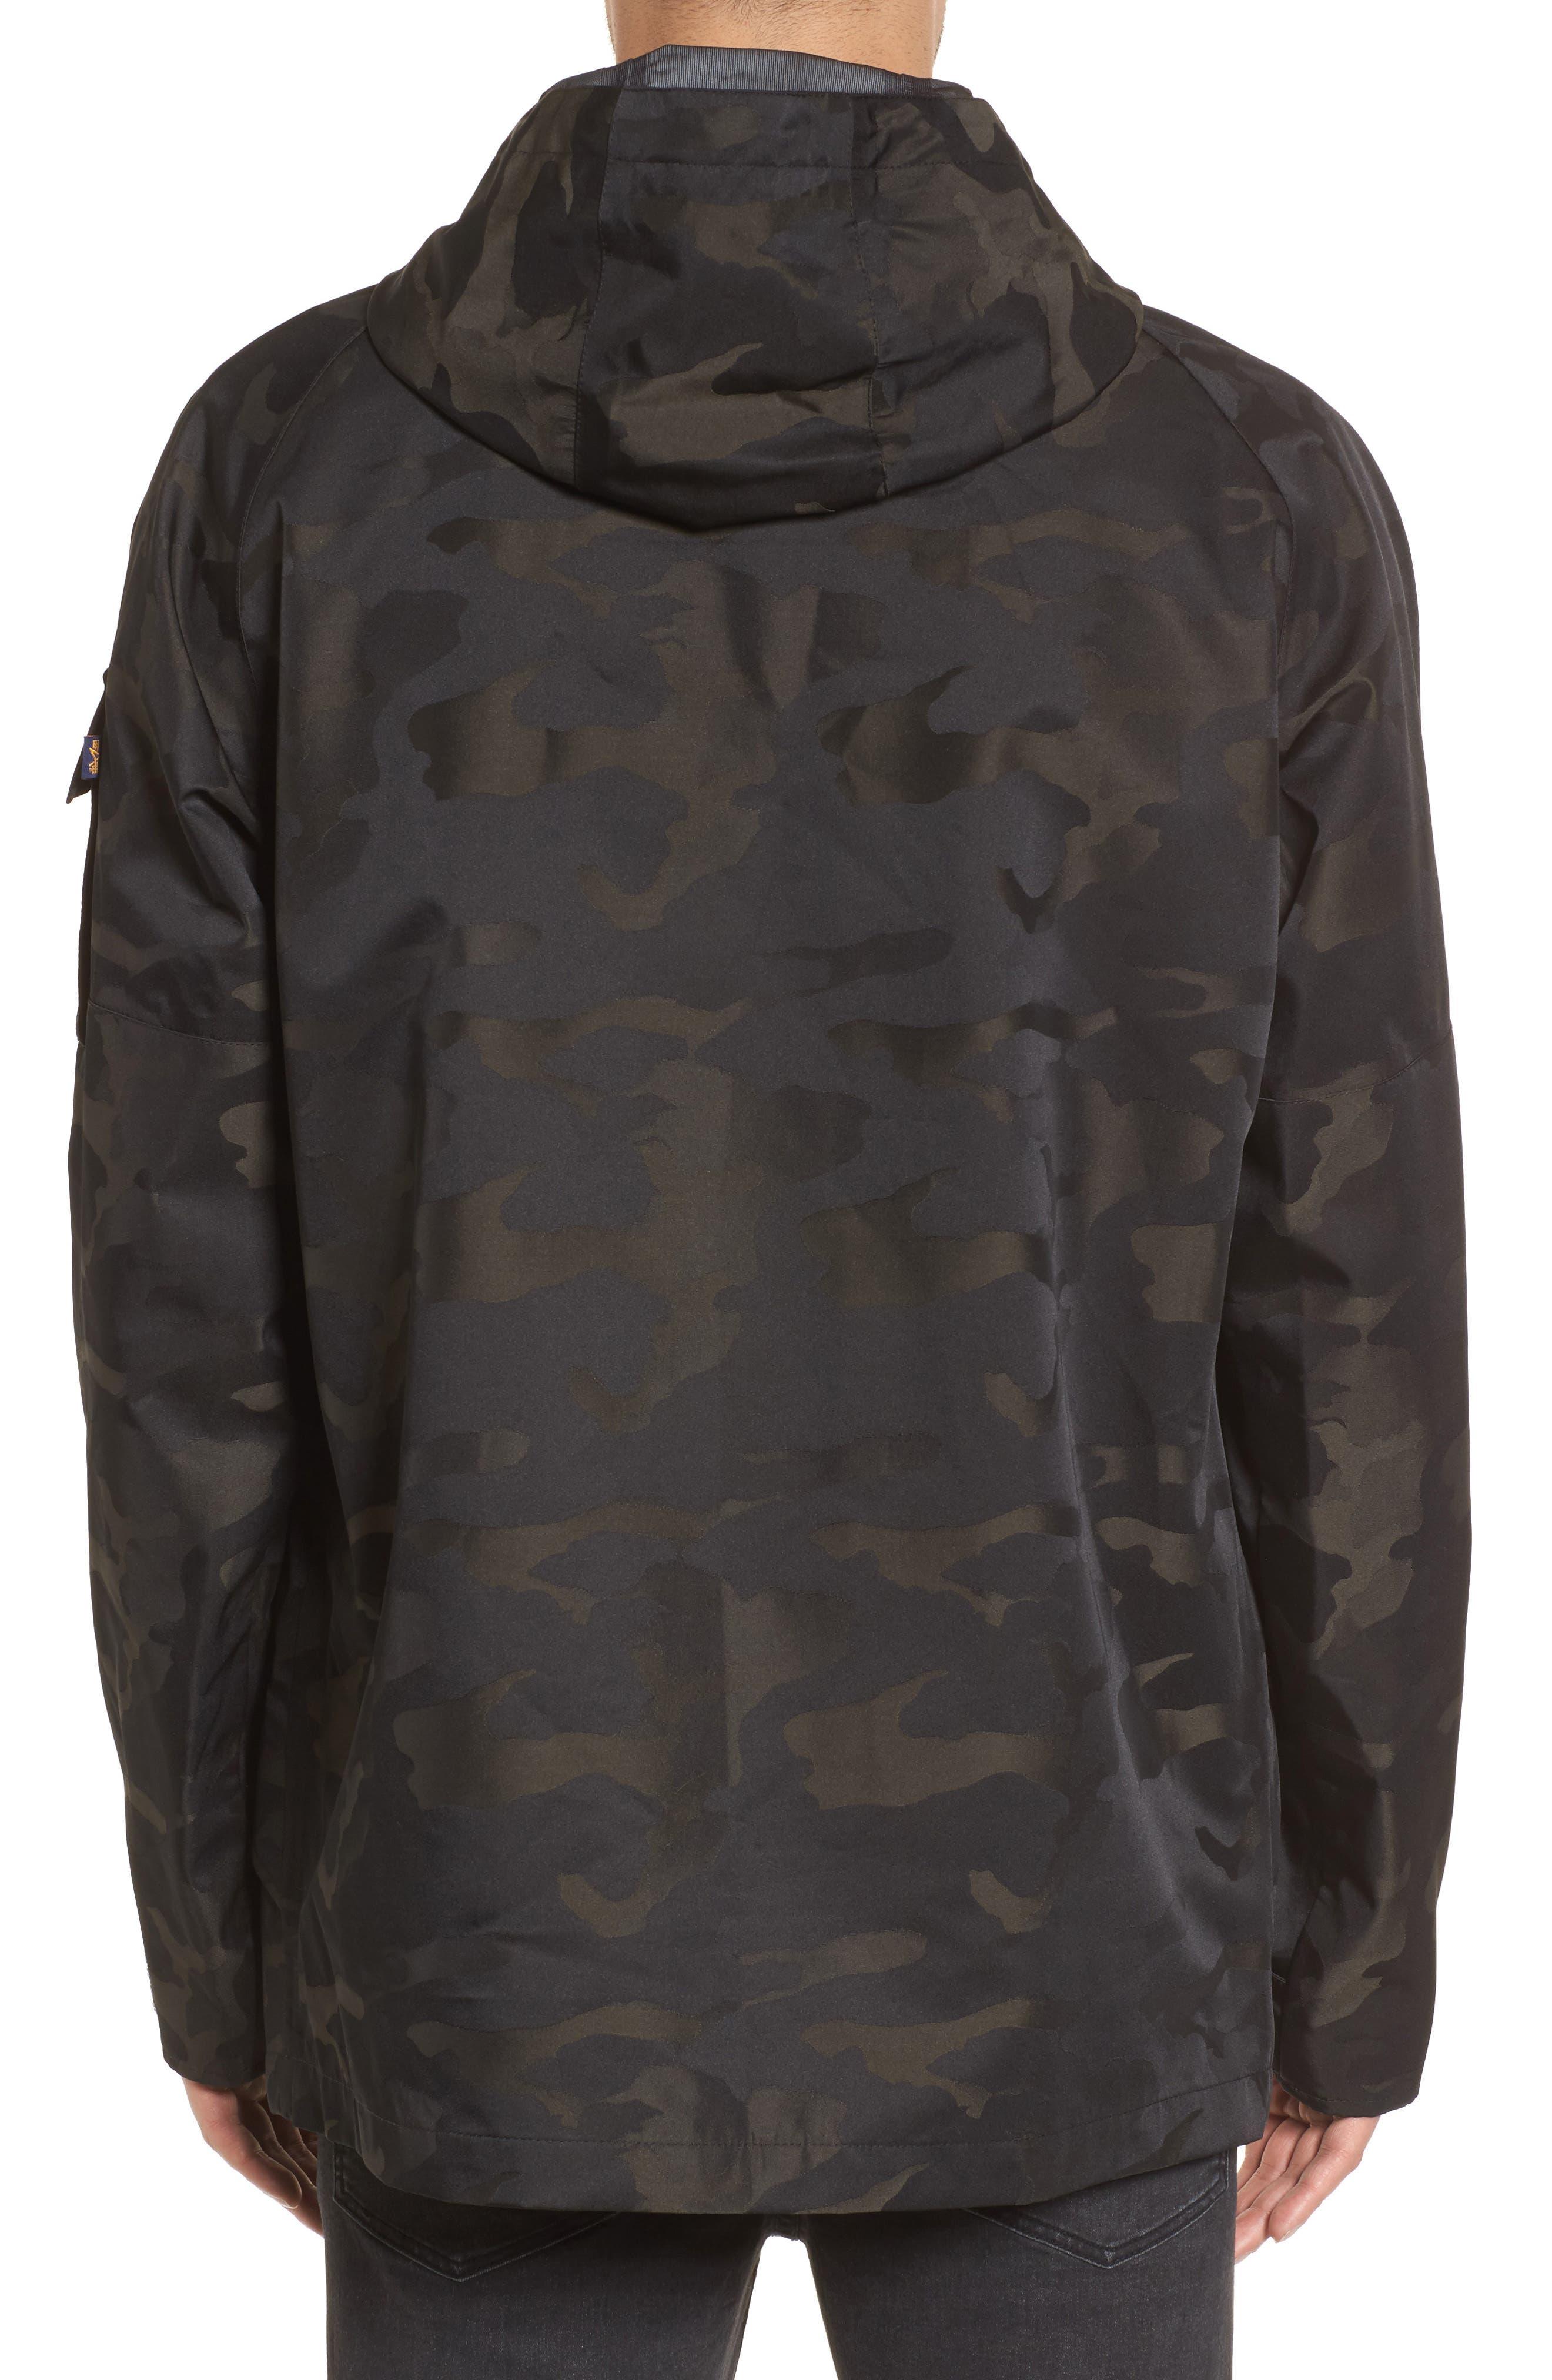 Torrent Camo Jacket,                             Alternate thumbnail 2, color,                             Black Camo